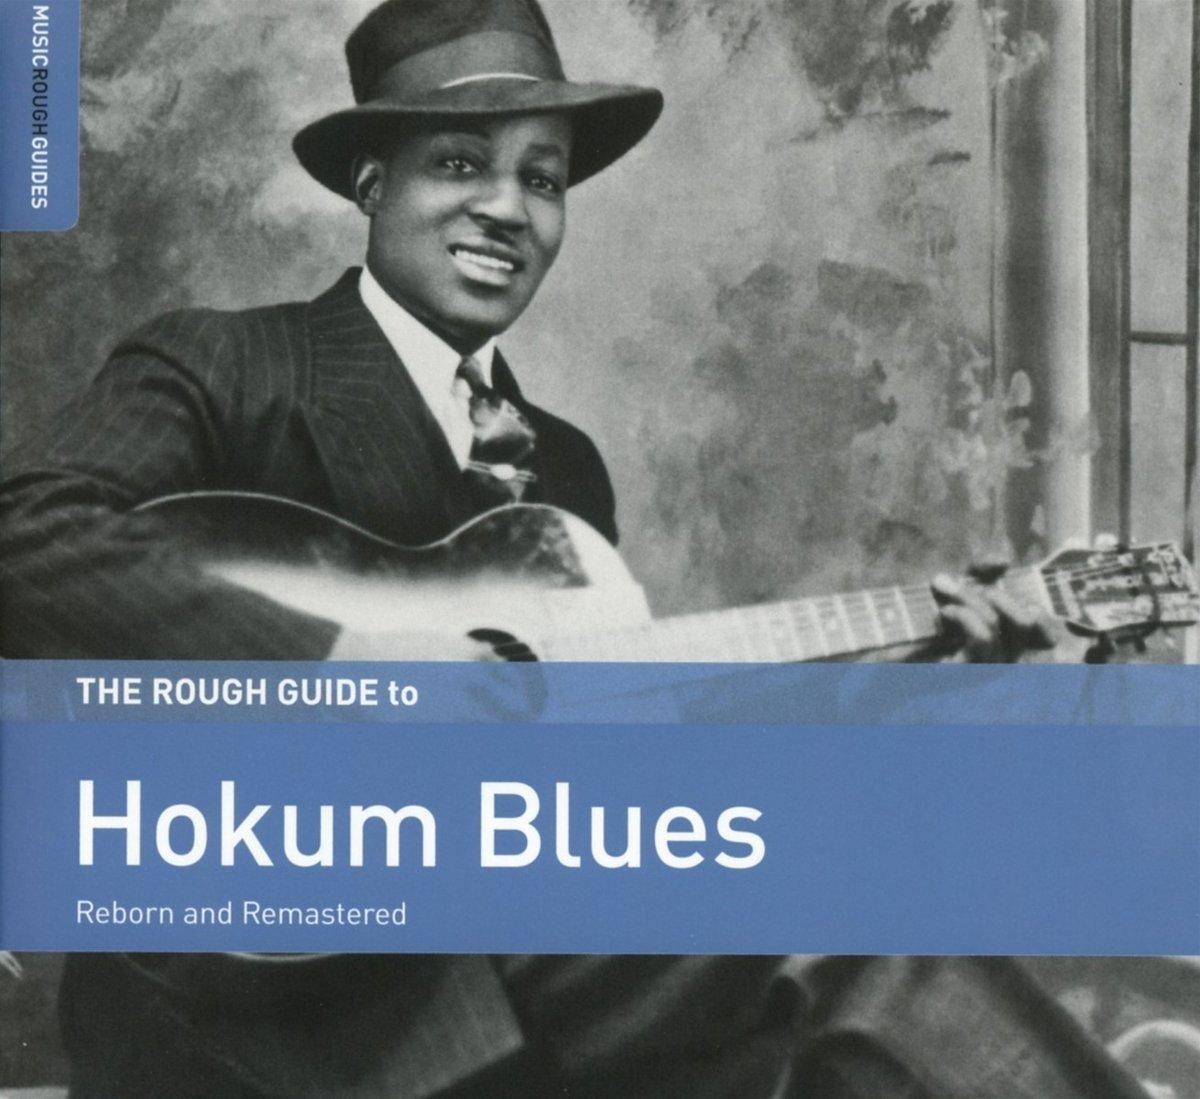 Hokum Blues. The Rough Guide kopen